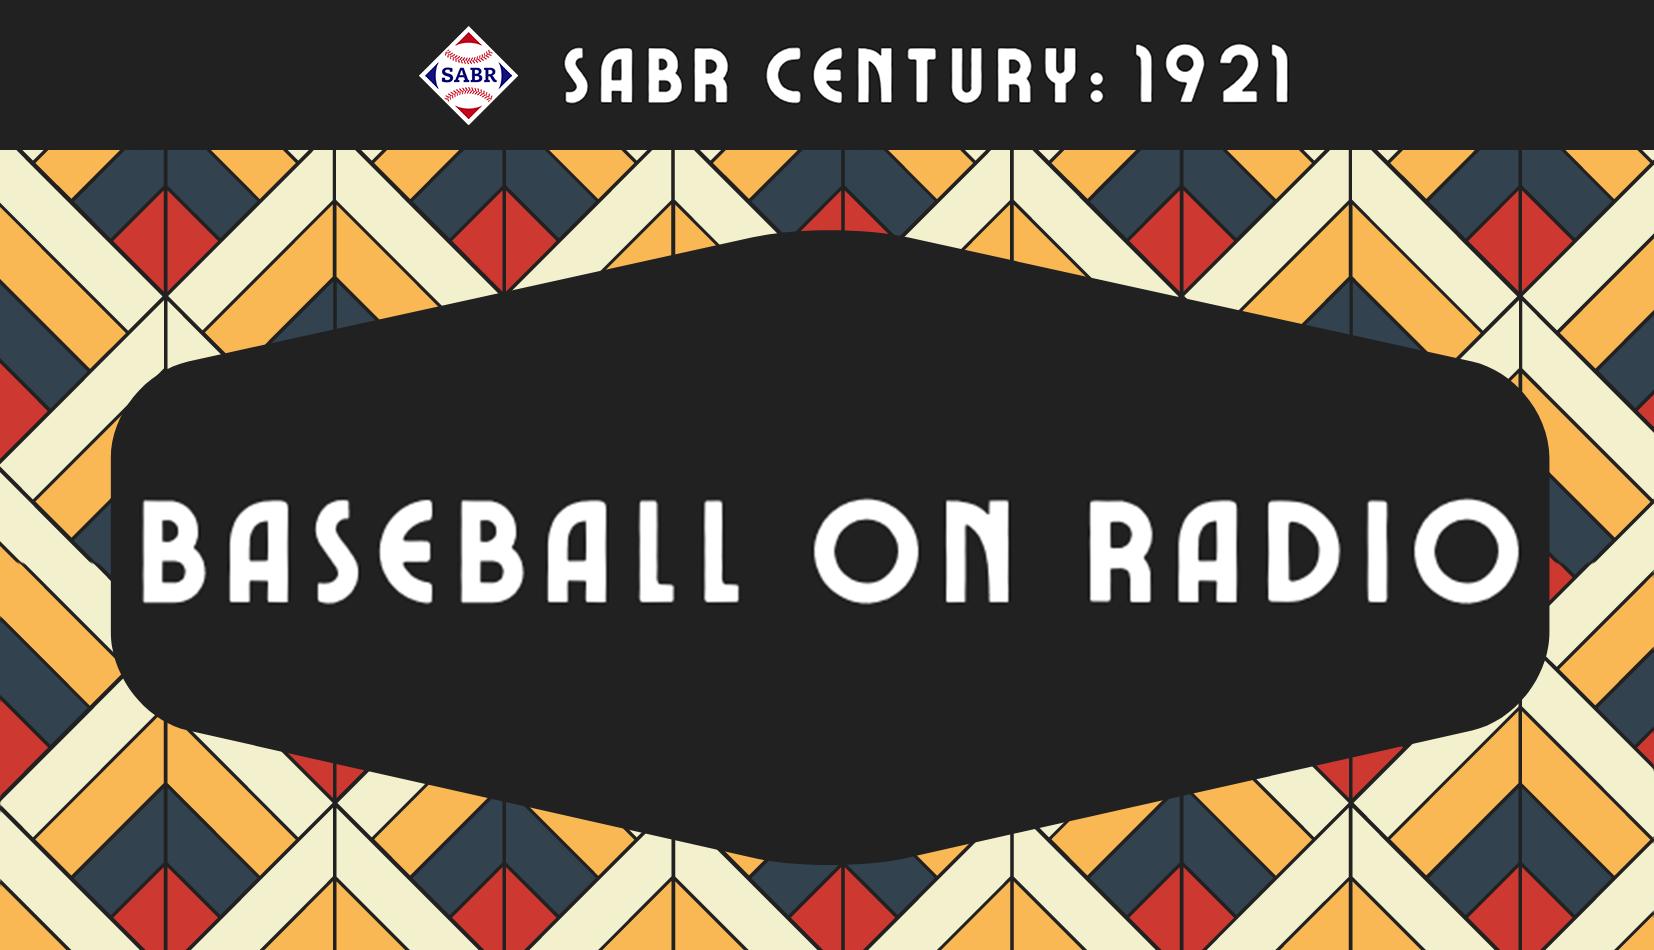 SABR Century: Baseball on Radio 1921